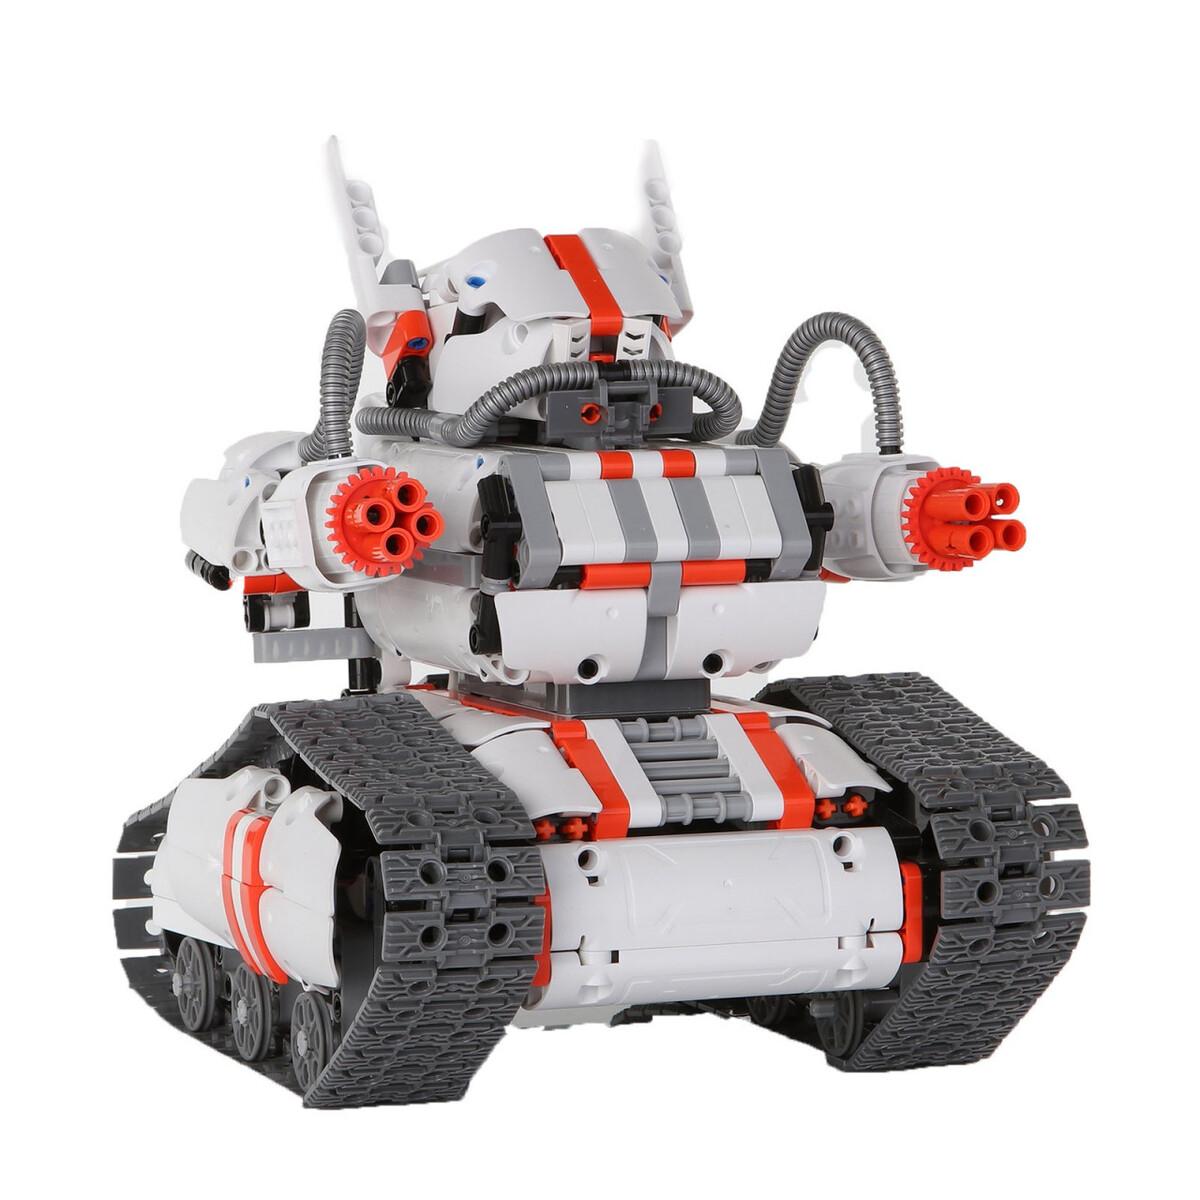 Bild 1 von Appgesteuerter Roboter Mi Robot Builder Rover